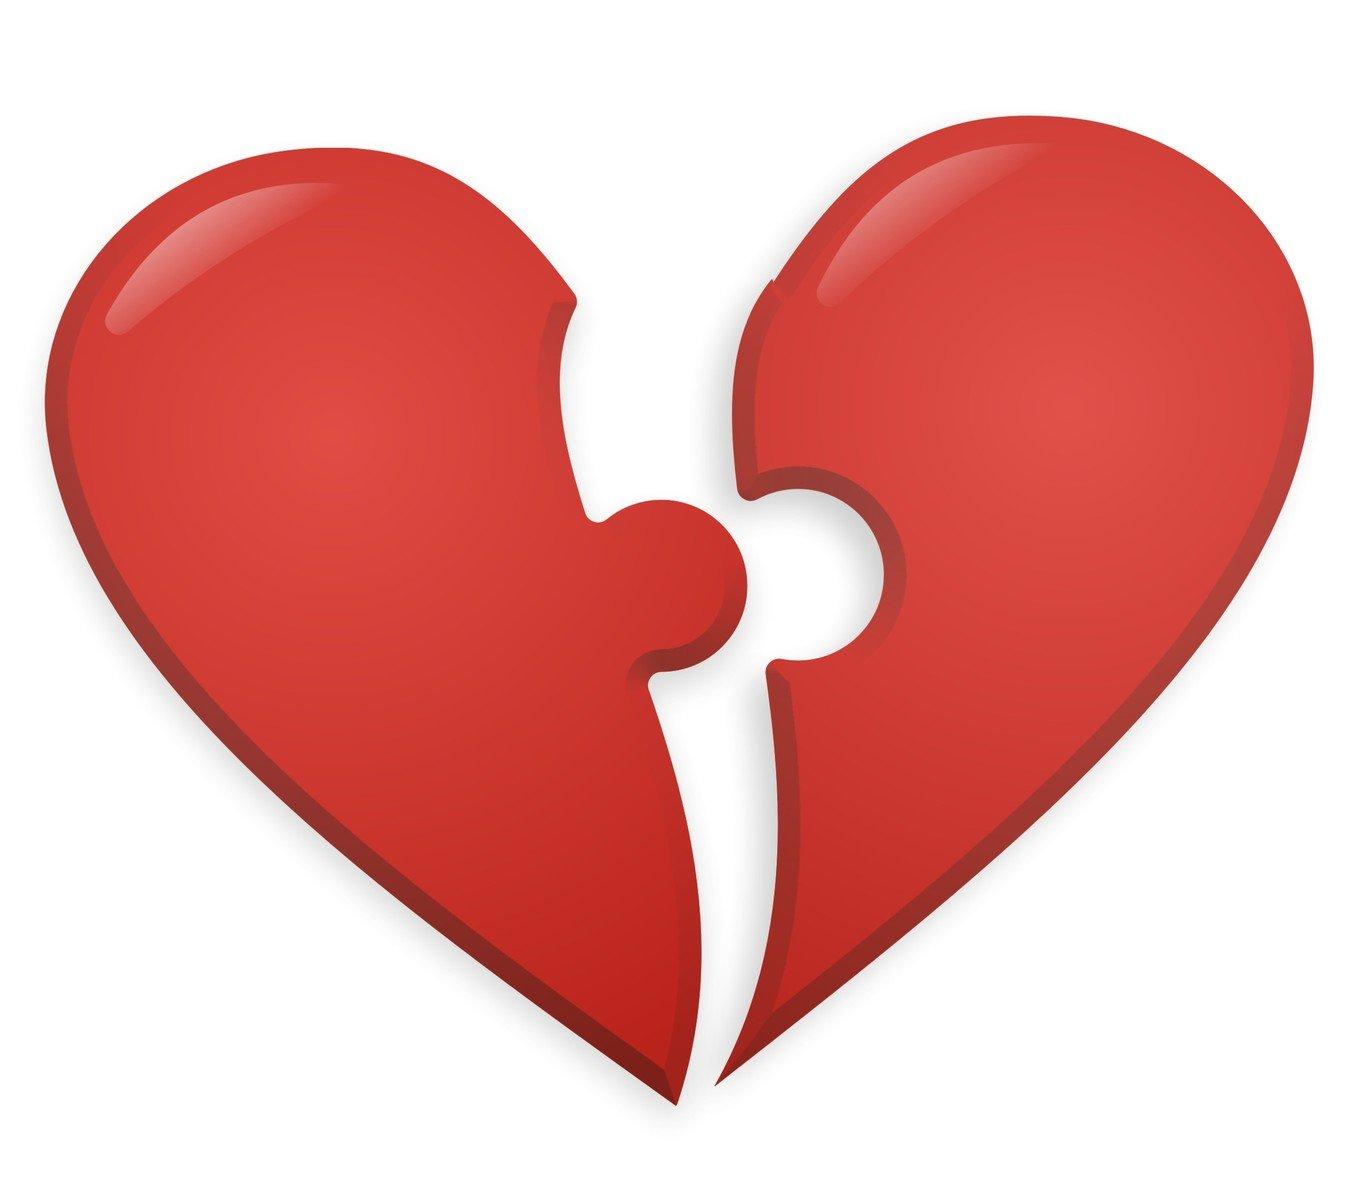 Картинки две половинки сердечка